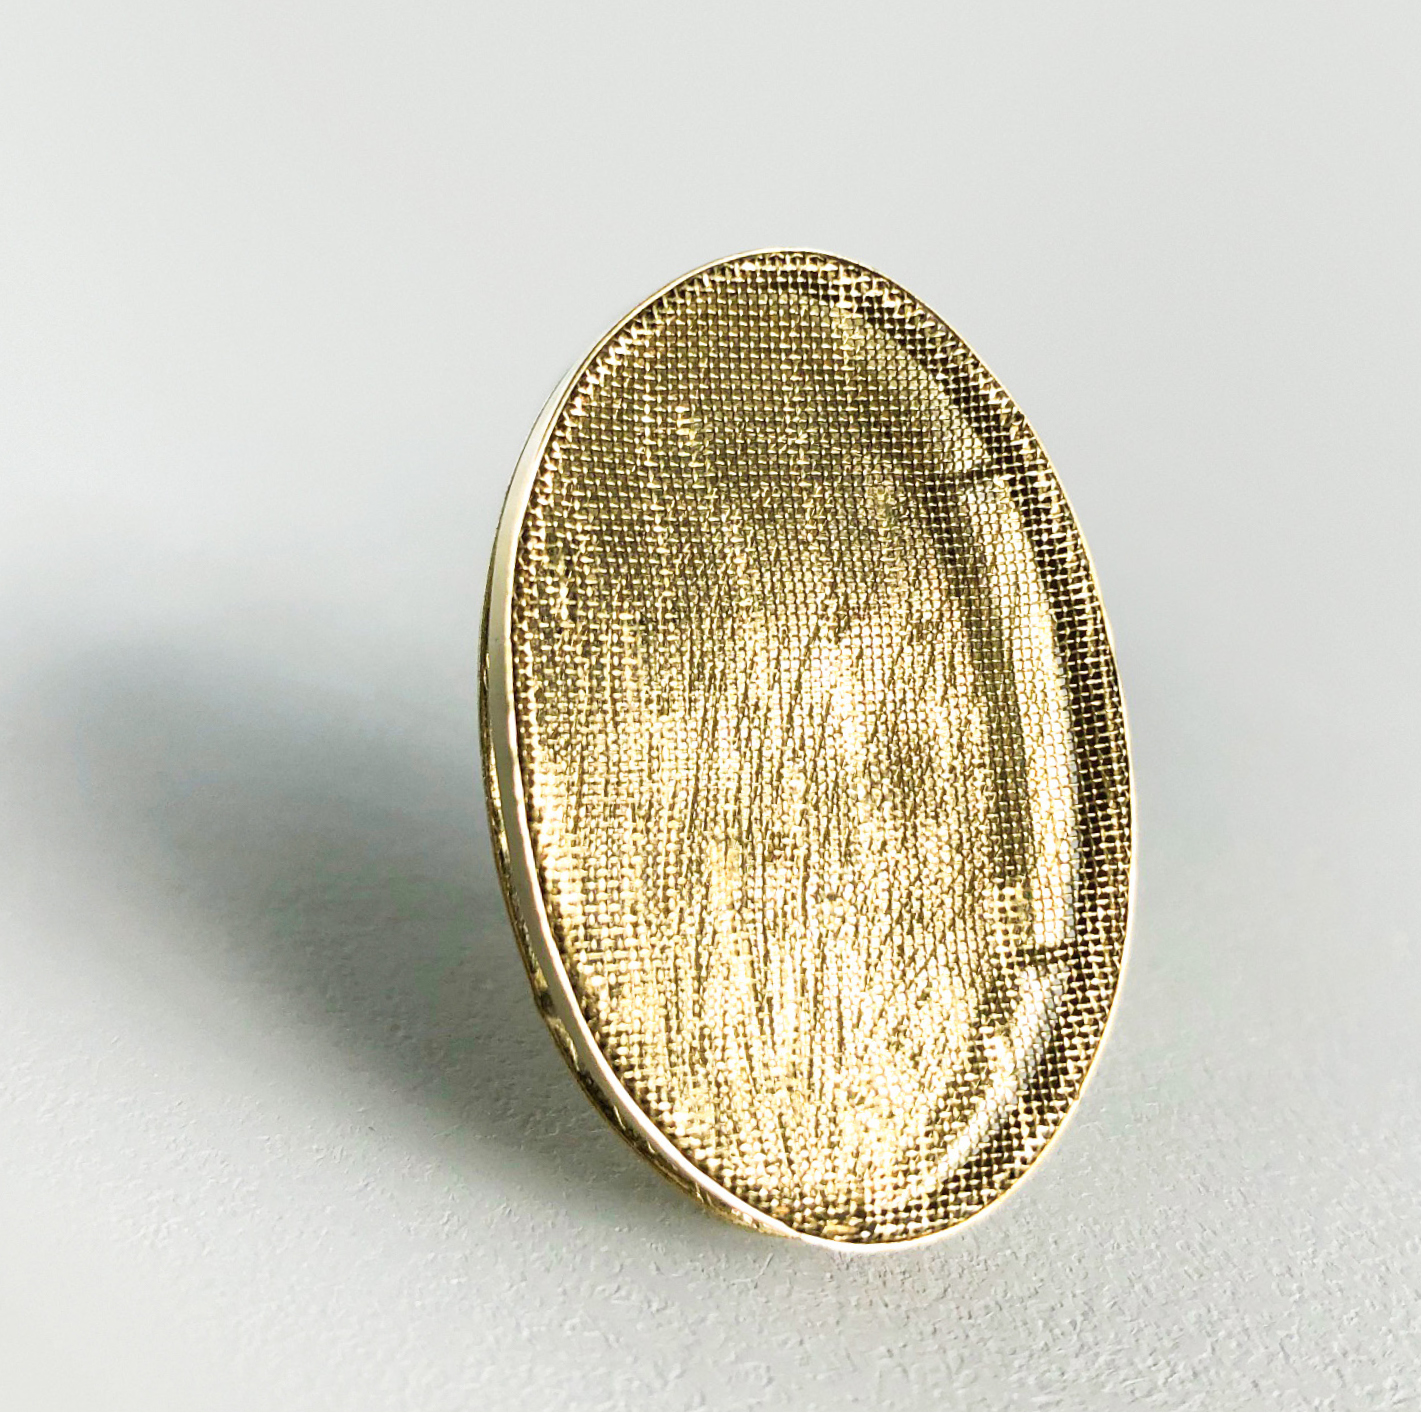 oval brass brooch on white background